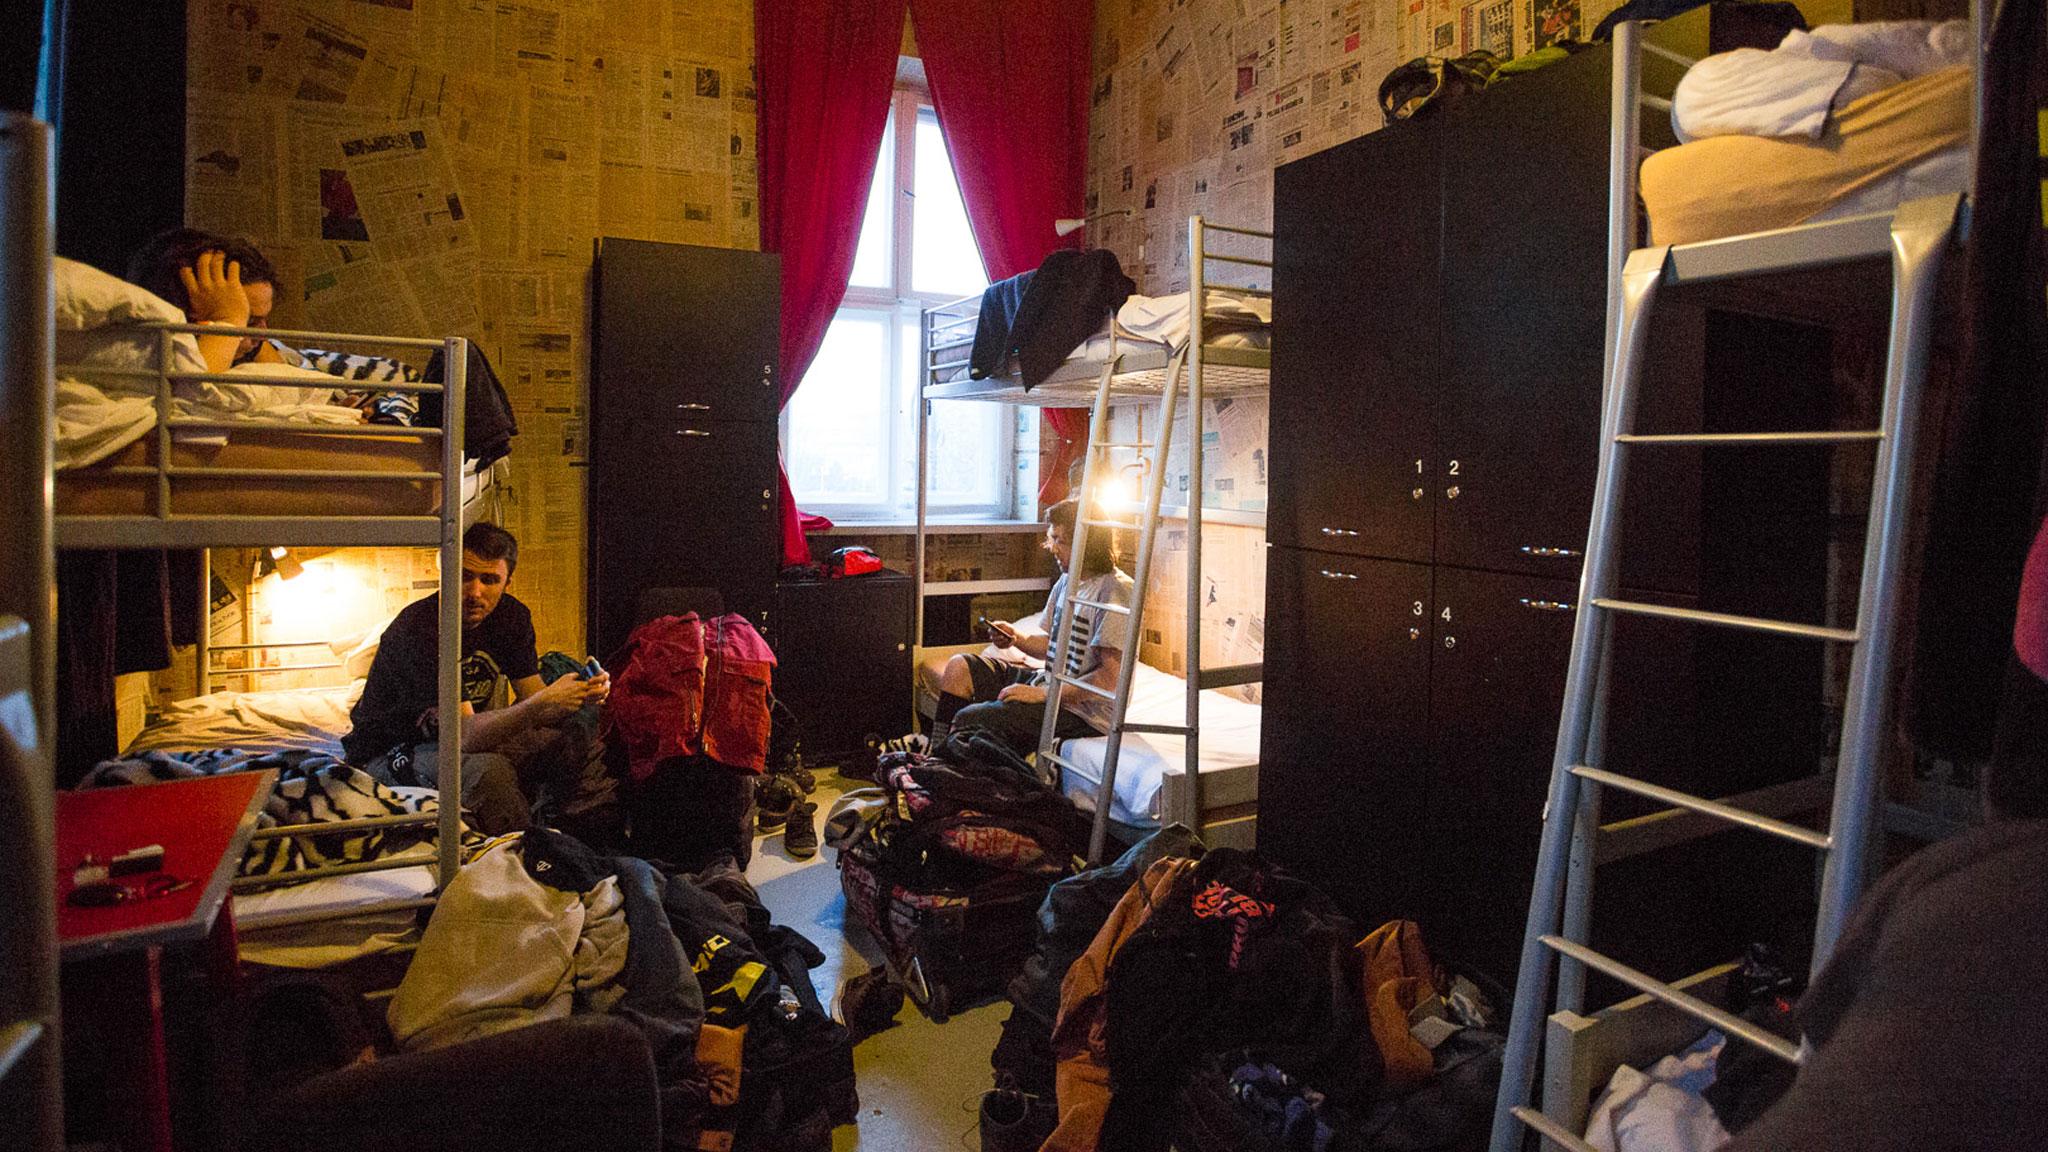 Hostel Living